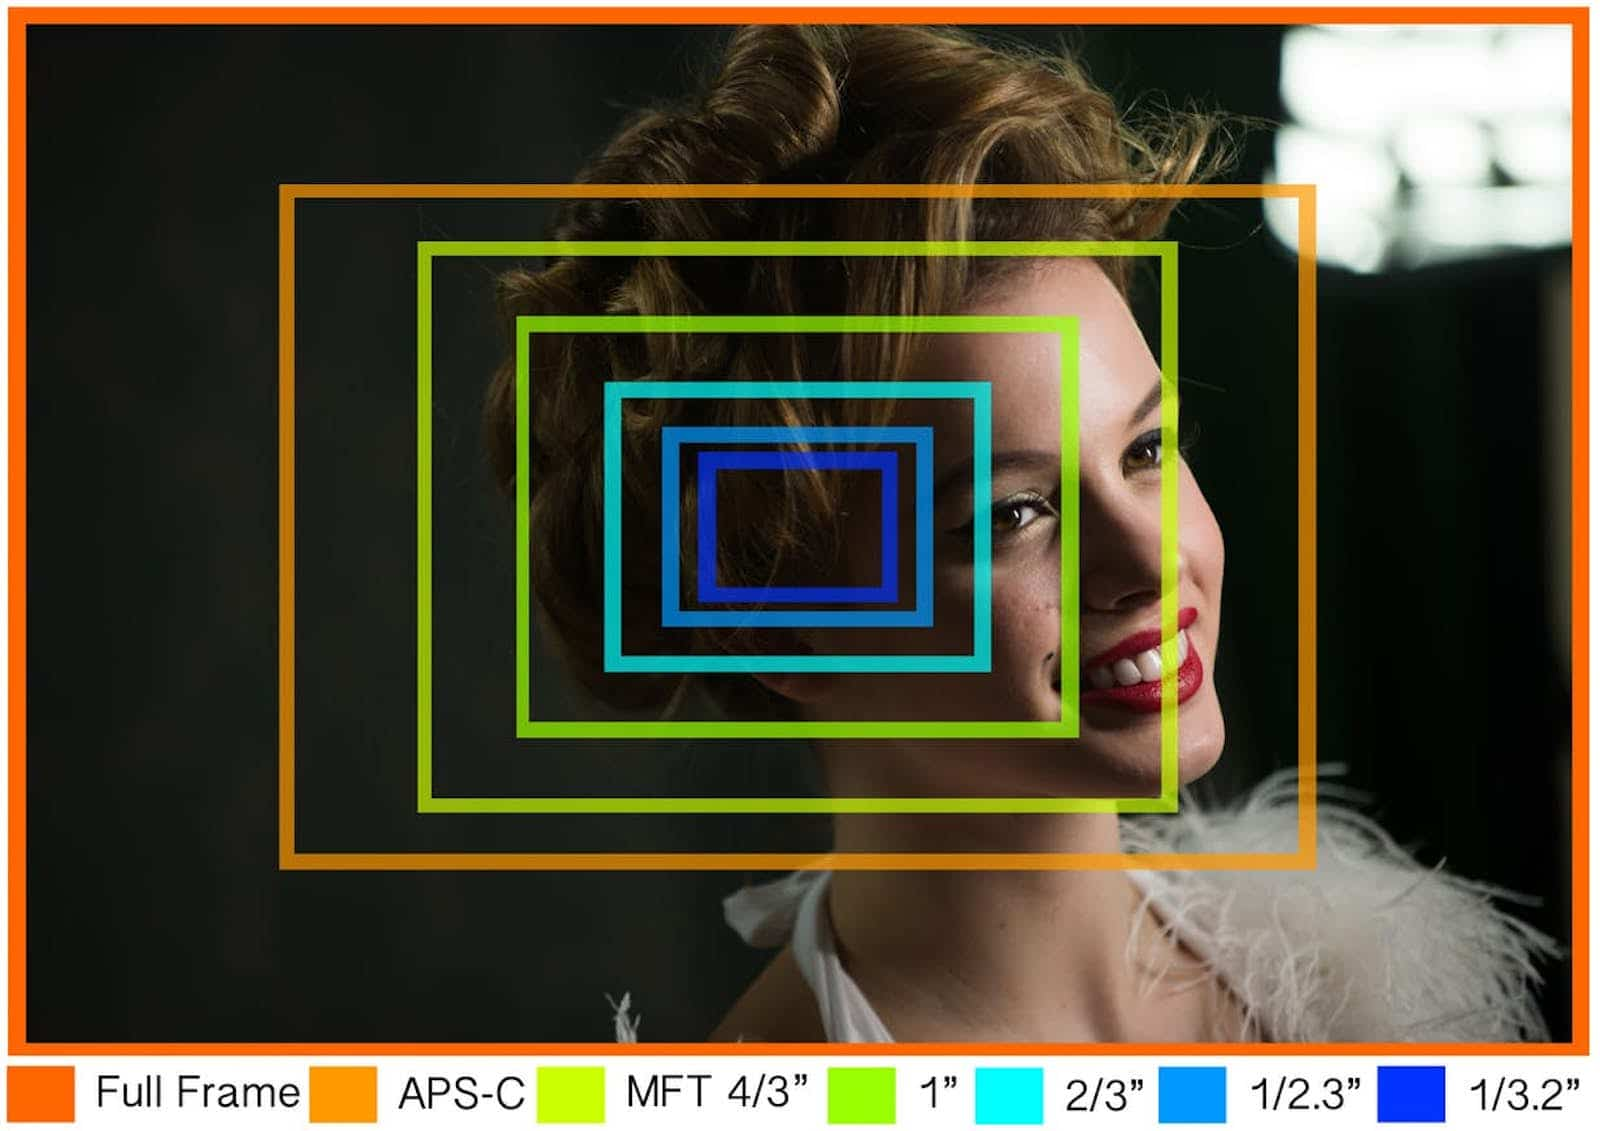 Camera Sensor Size Explained - Angle of View - Image